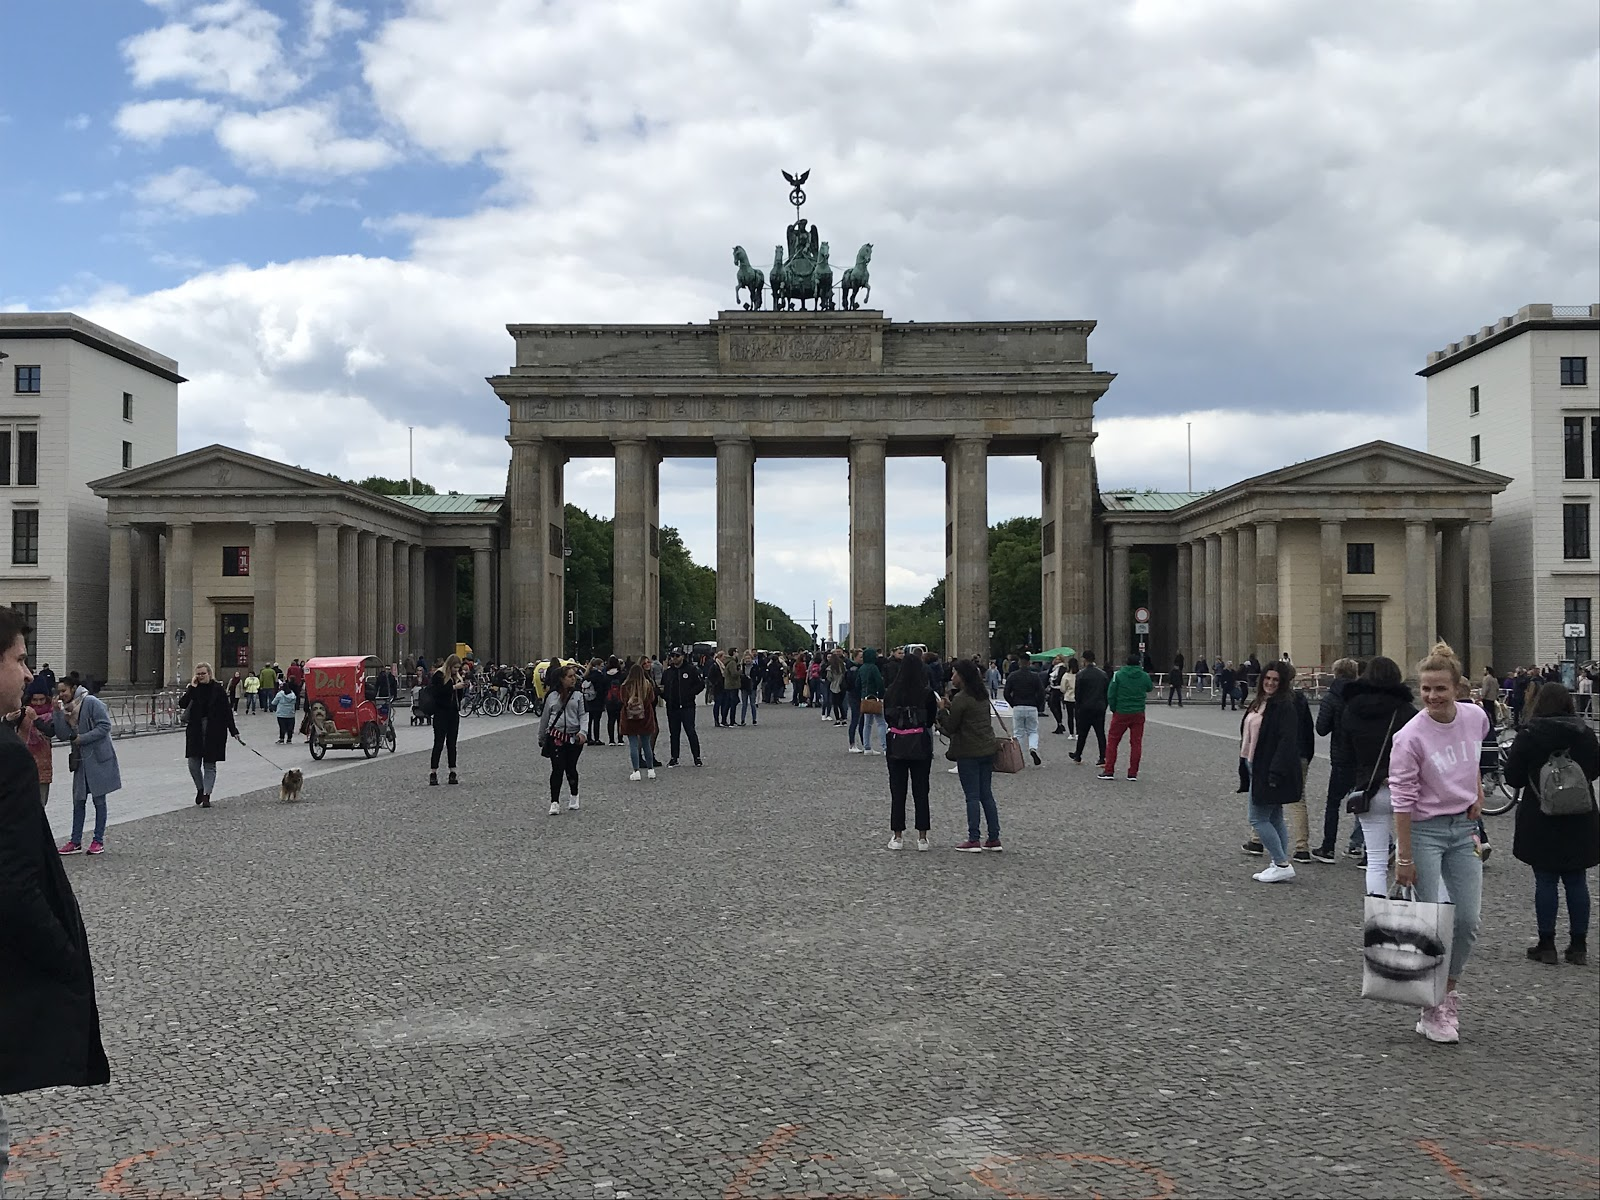 Brandenburg Gate in Berlin, Germany (Photo courtesy of Kyle McIntyre)